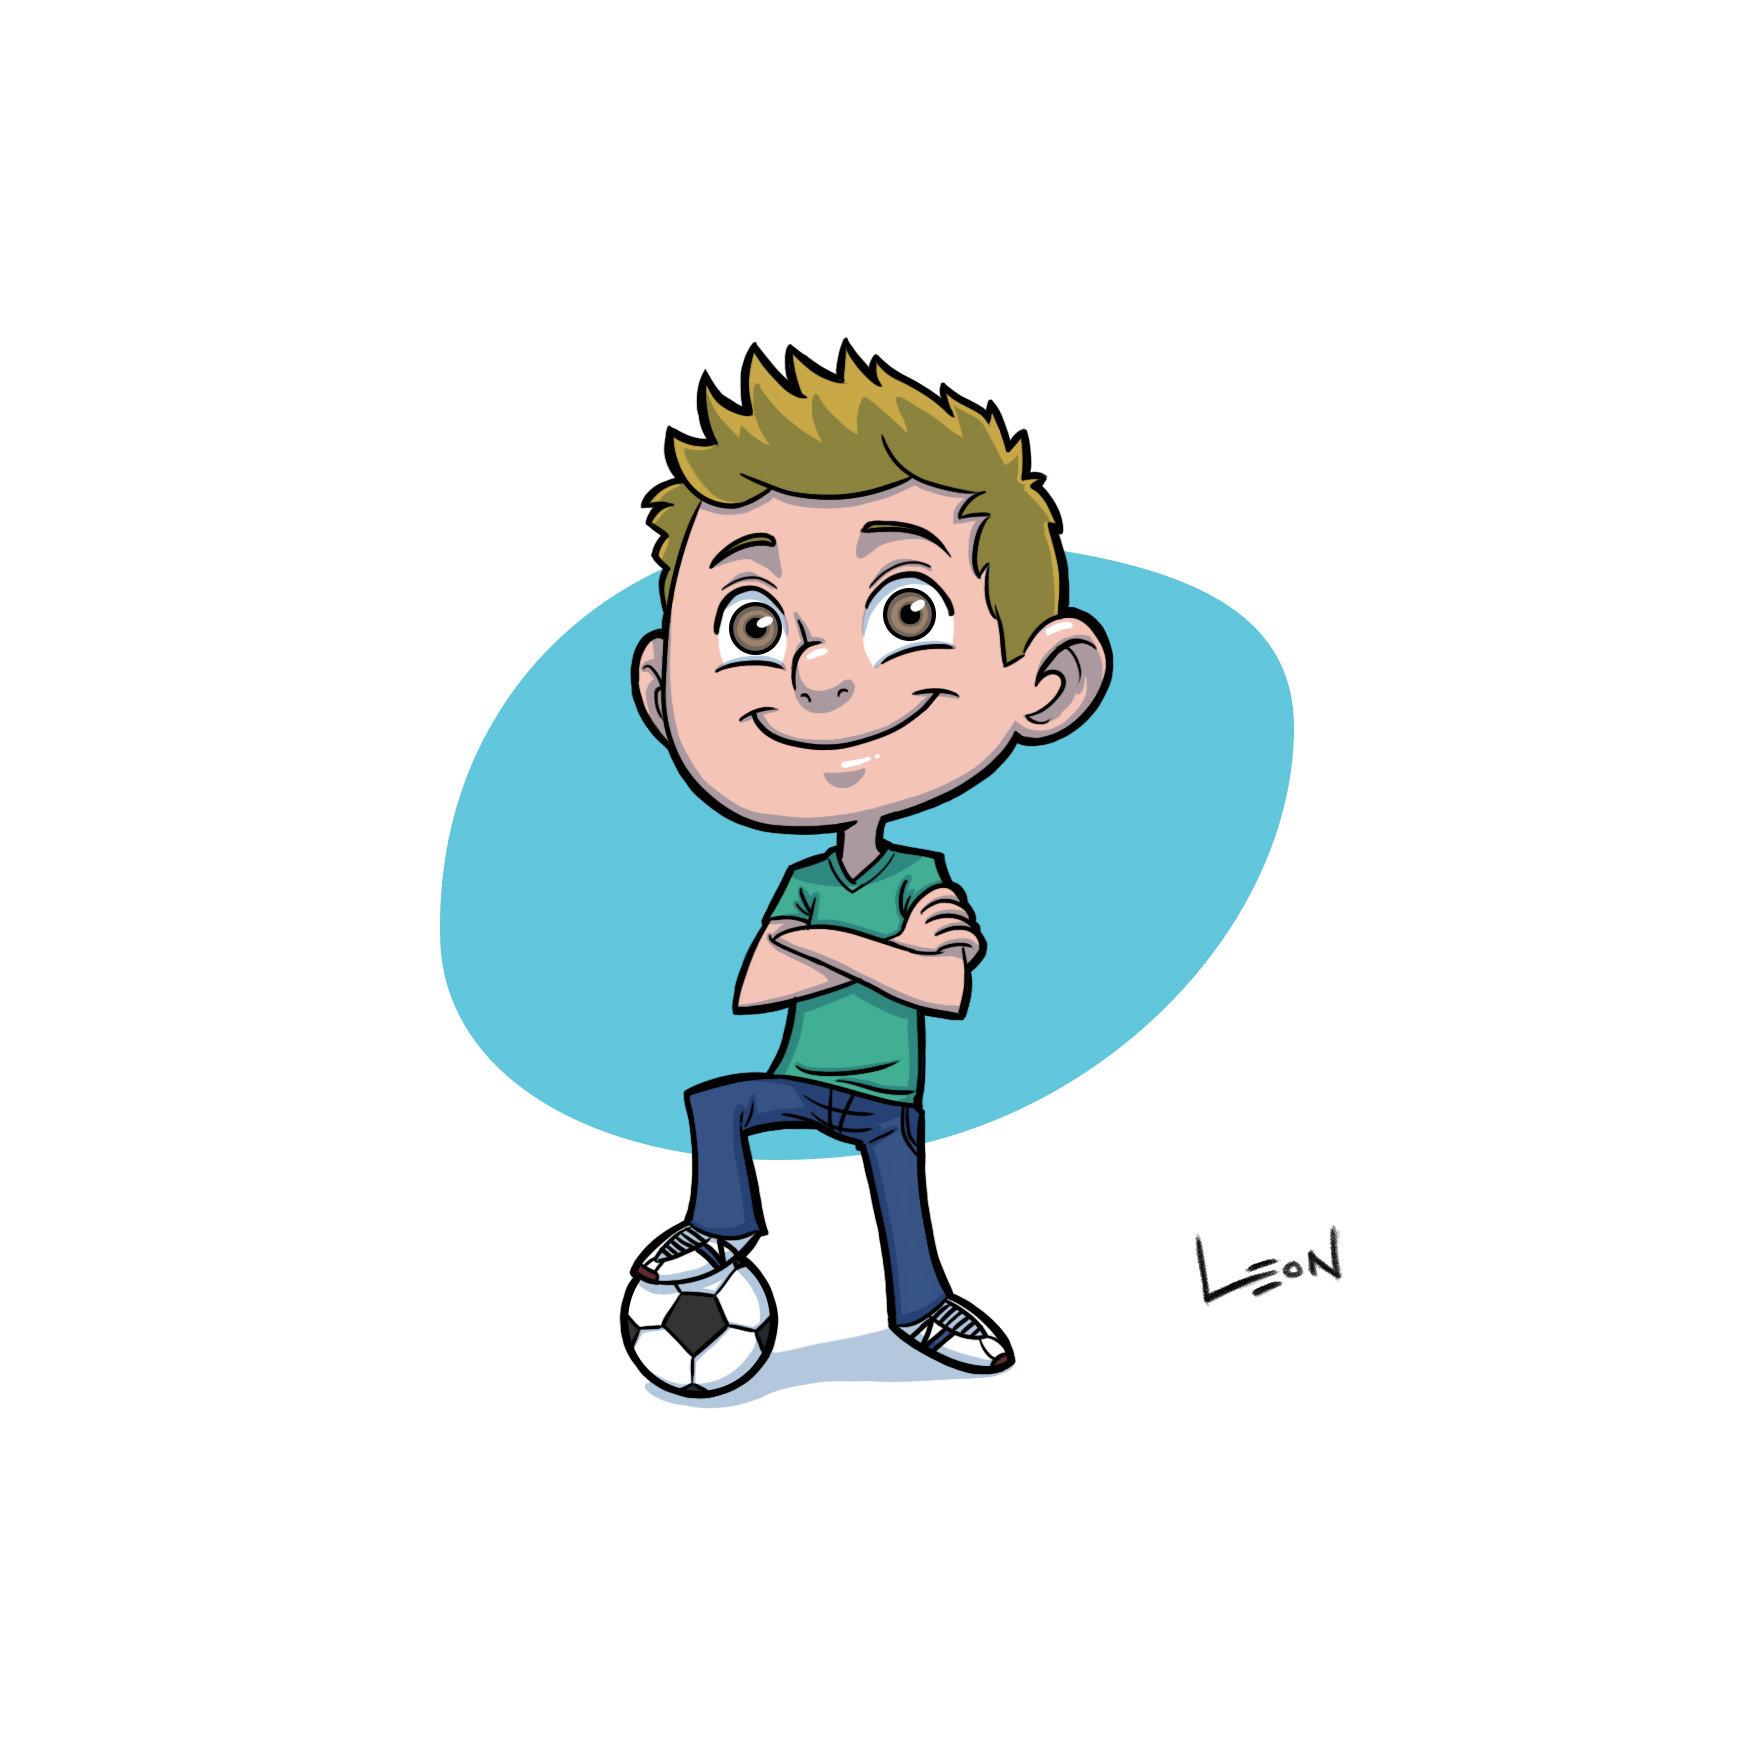 Leon bolwerk radboud 01